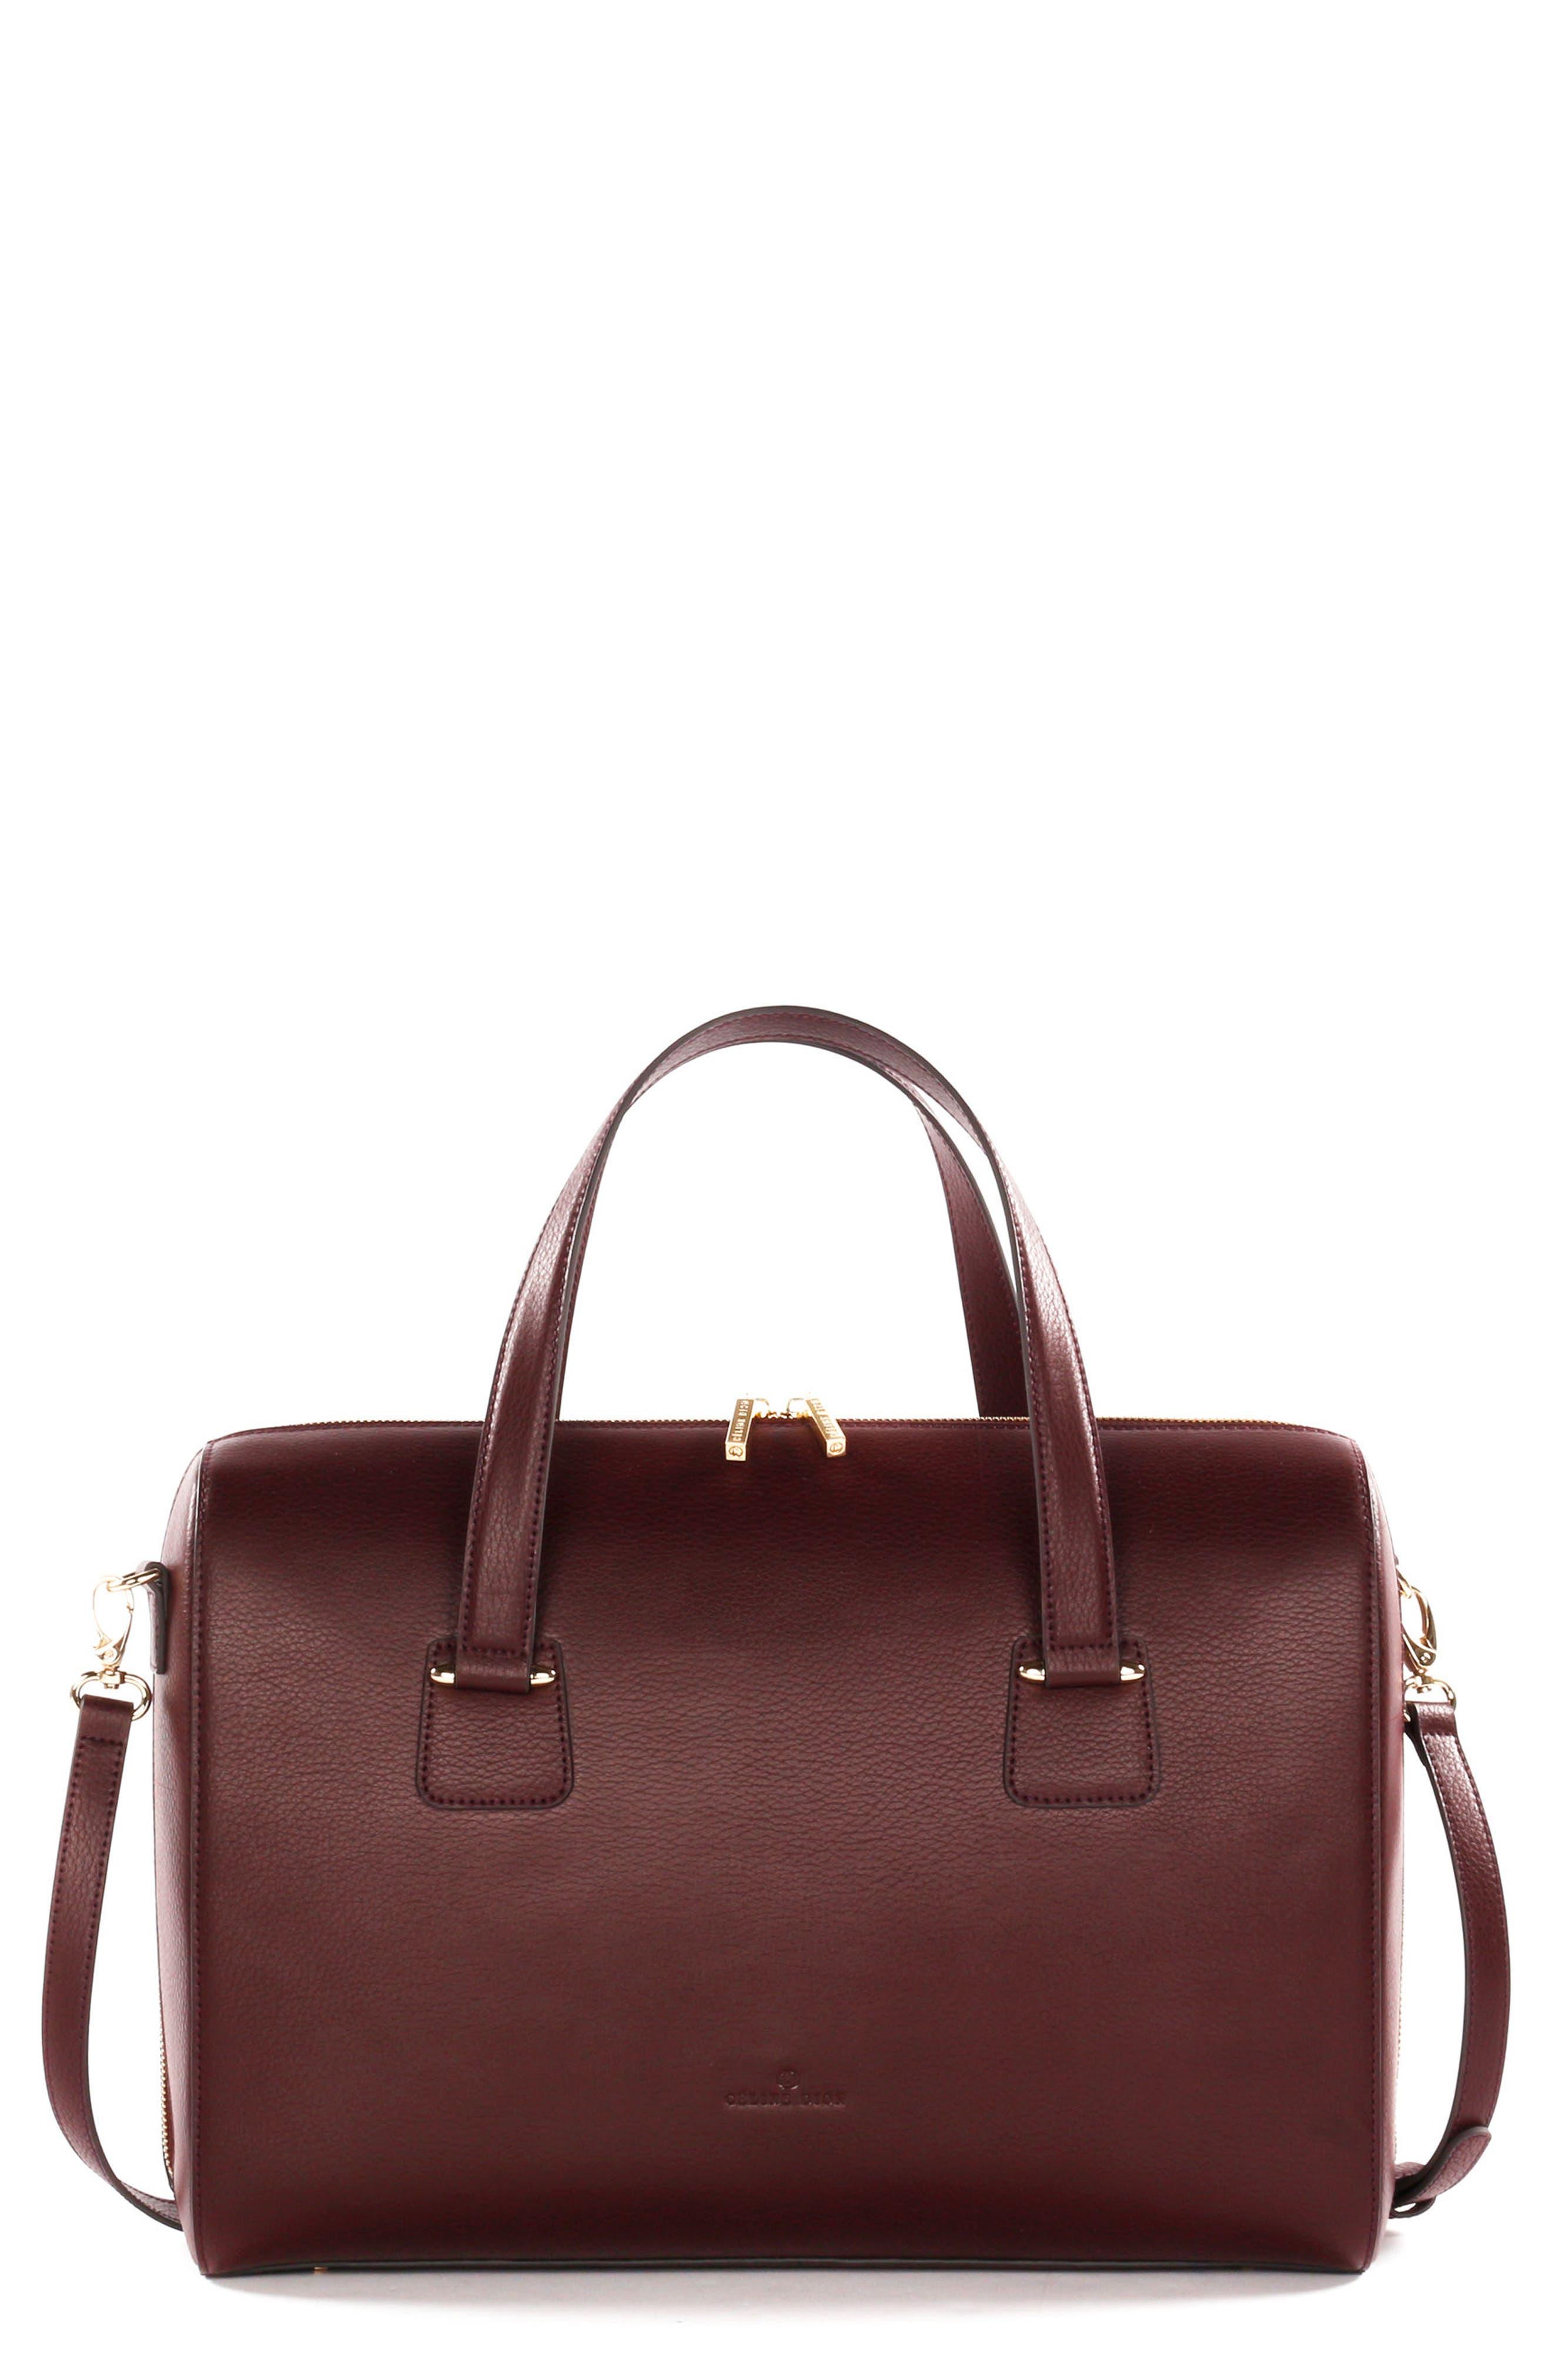 Alternate Image 1 Selected - Céline Dion Triad Leather Satchel